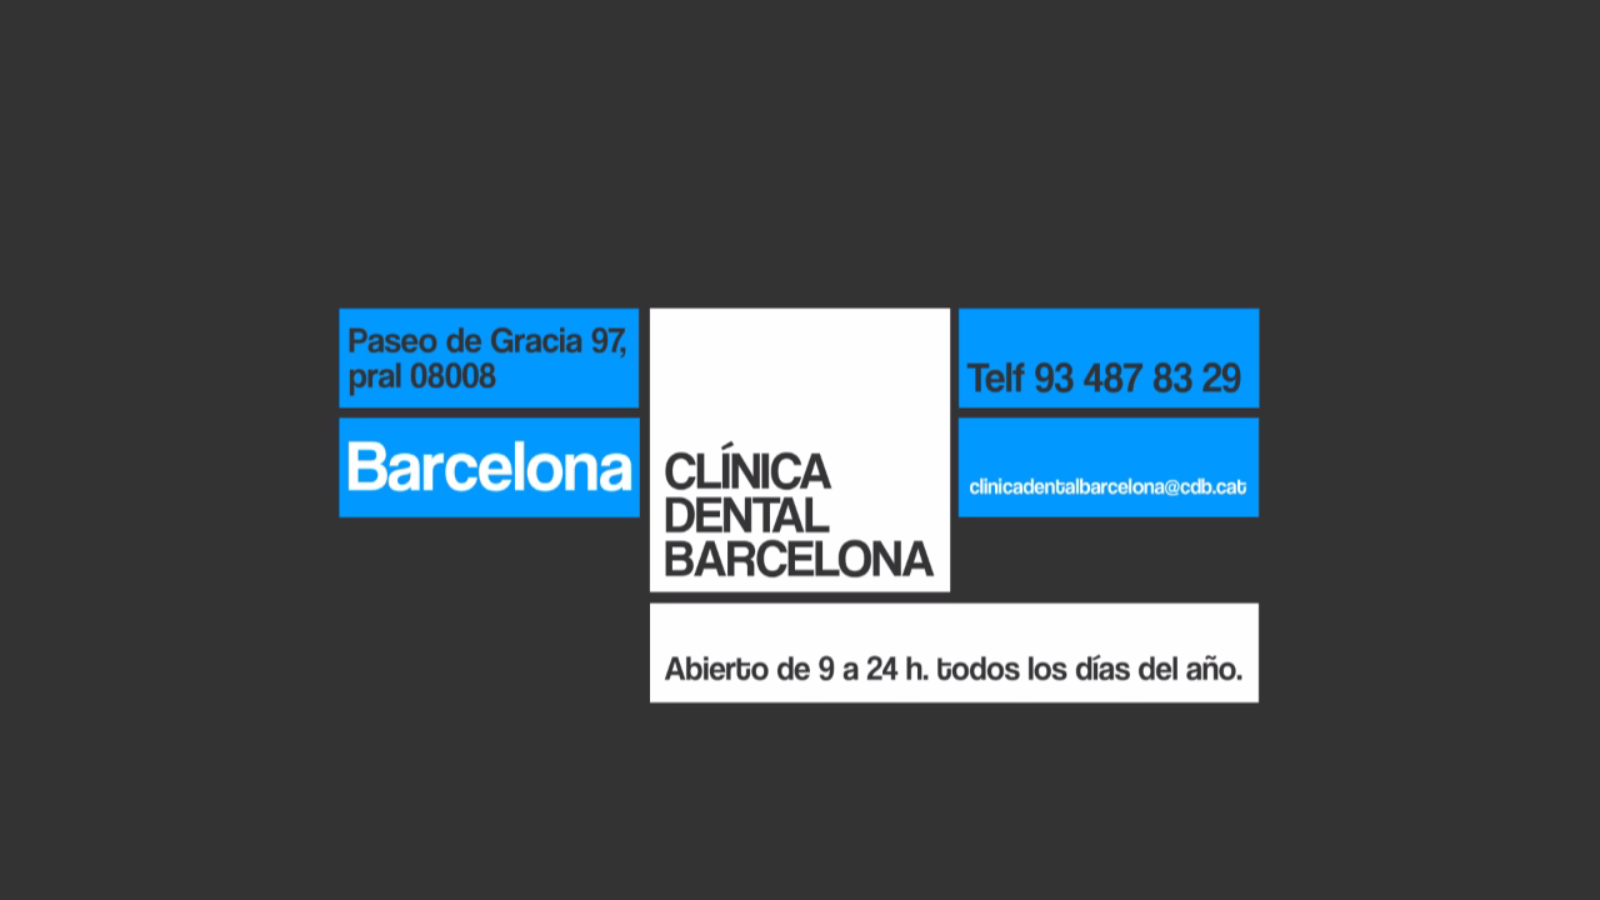 VPROMO Clínica Dental Barcelona